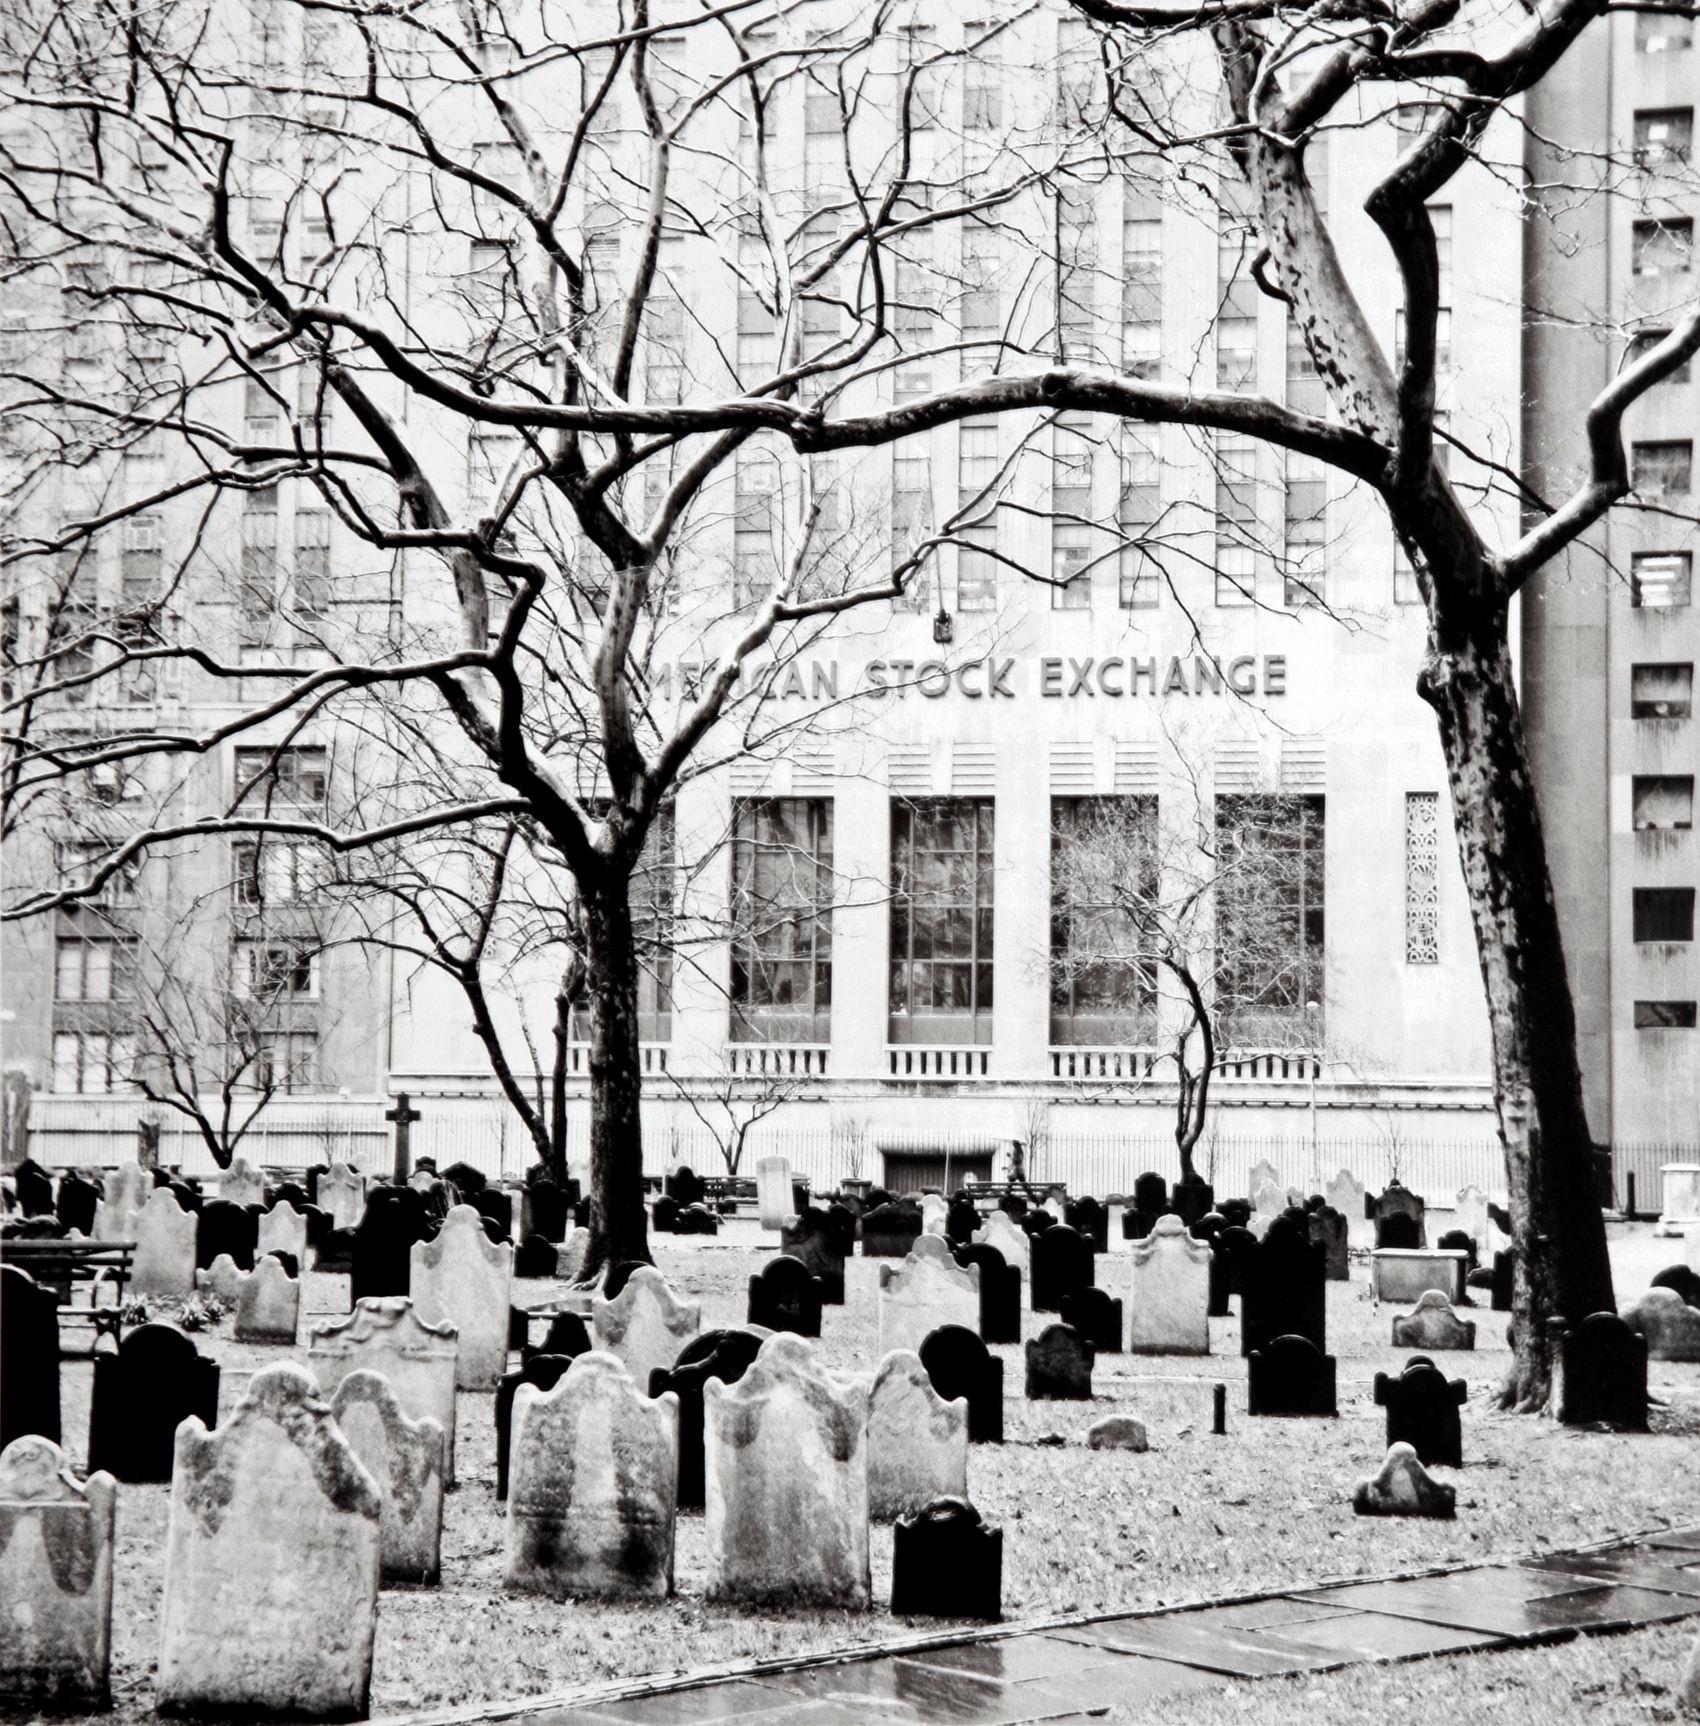 Trinity Church, Wall St. New York